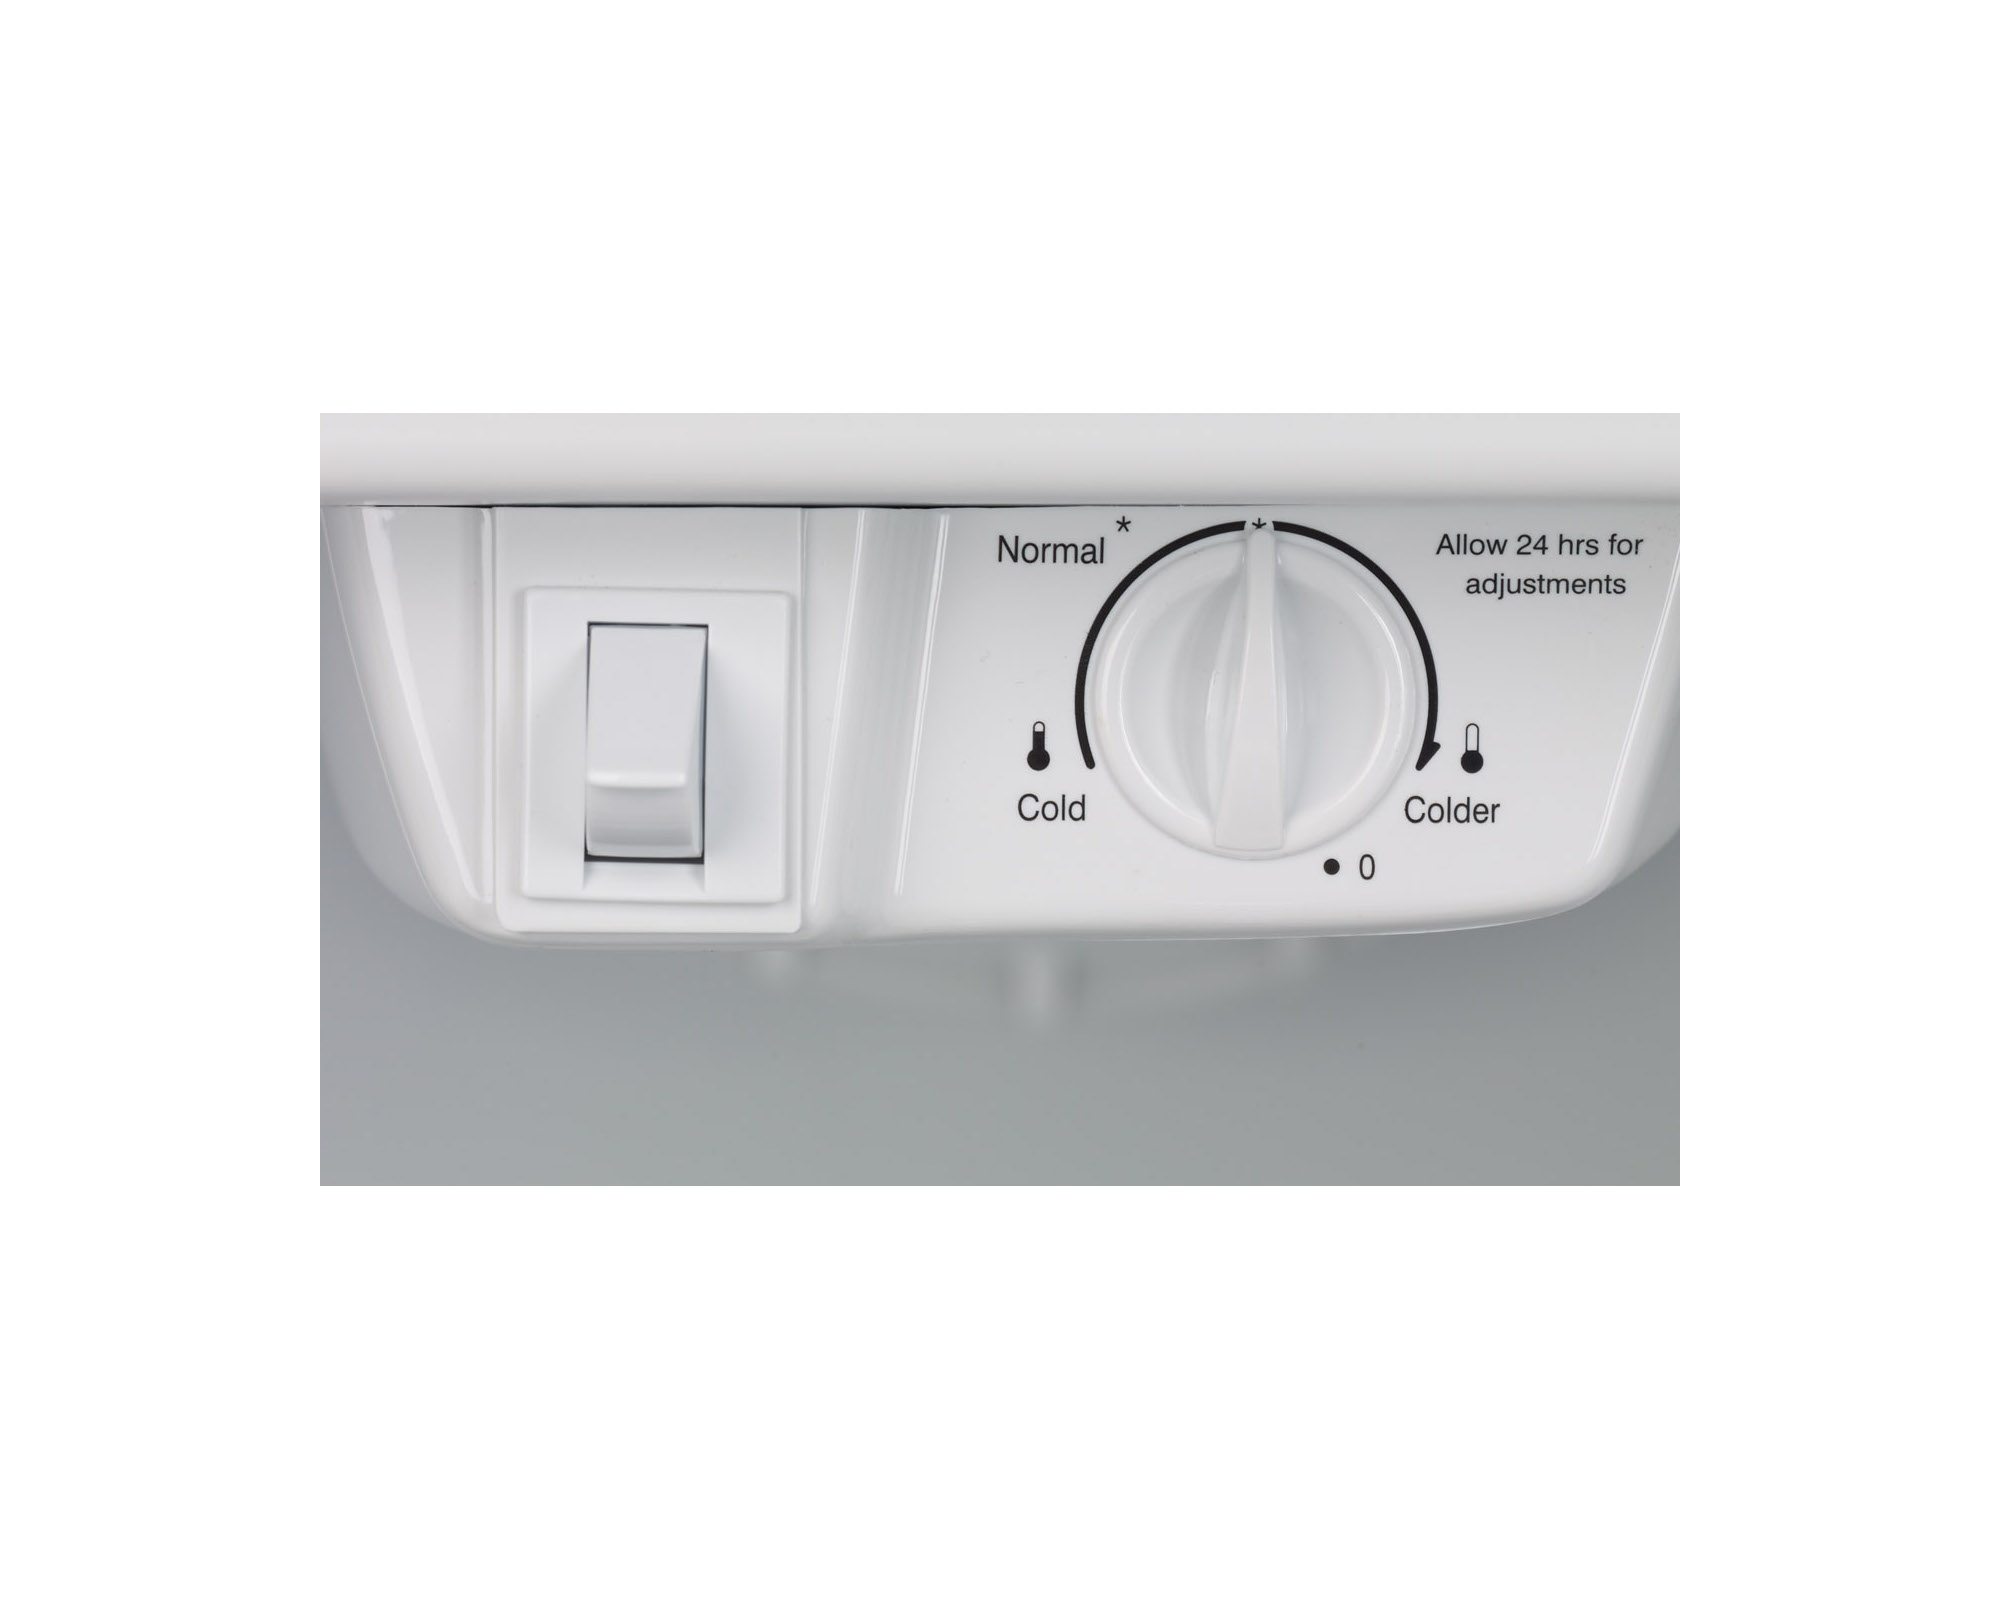 Frigidaire FFTR1821QS 18 cu. ft. Top Freezer Refrigerator - Stainless Steel